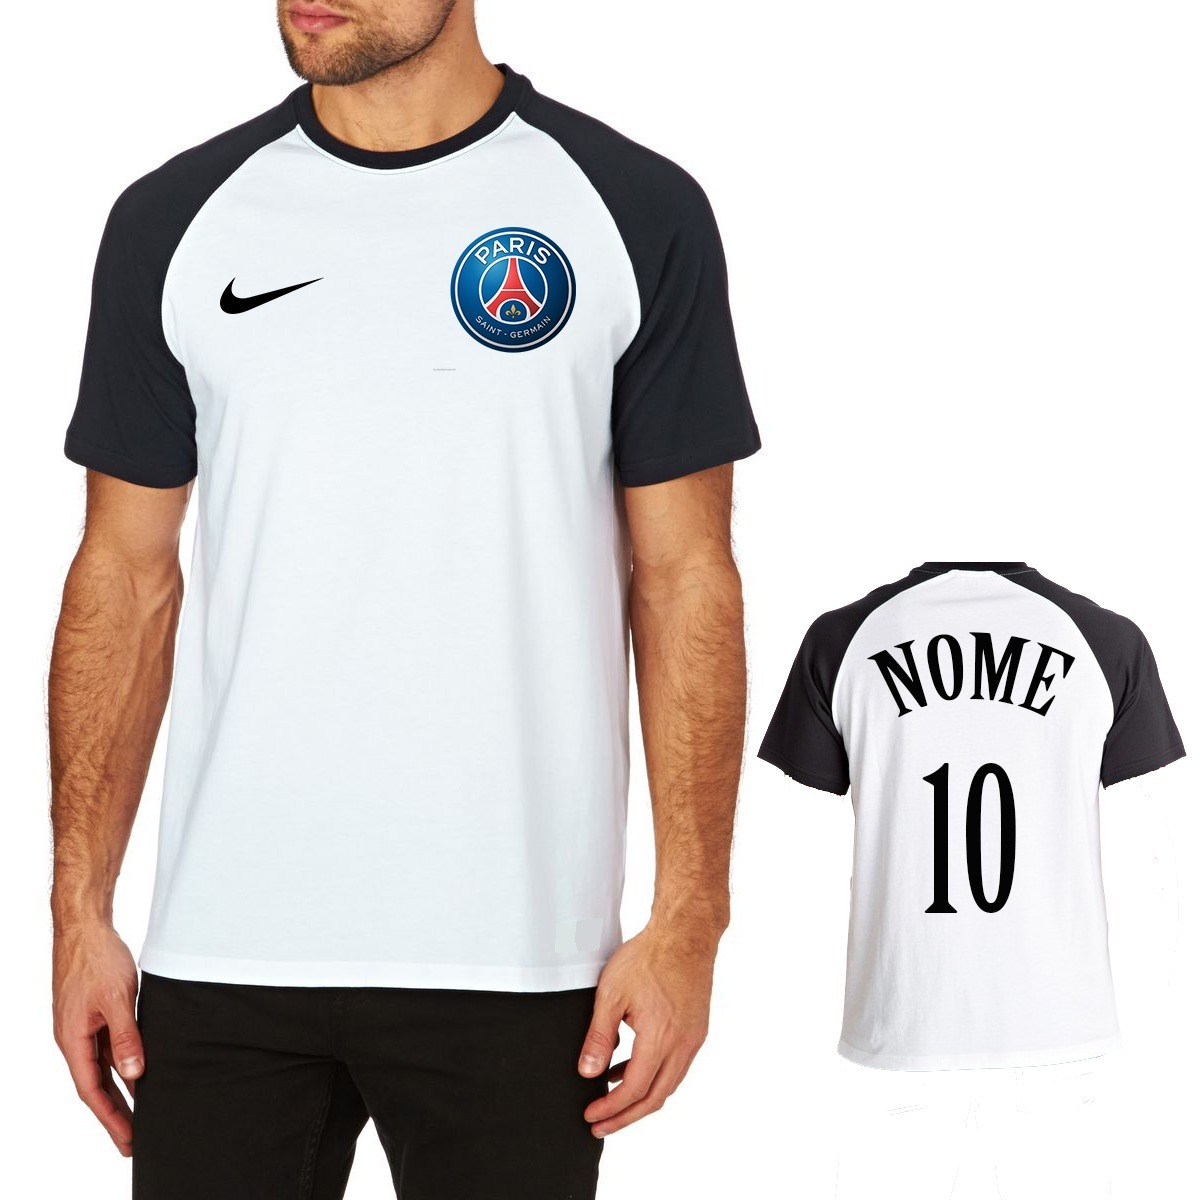 50831910b5 camisa raglan paris saint-germain psg masculina time futebol. Carregando  zoom.